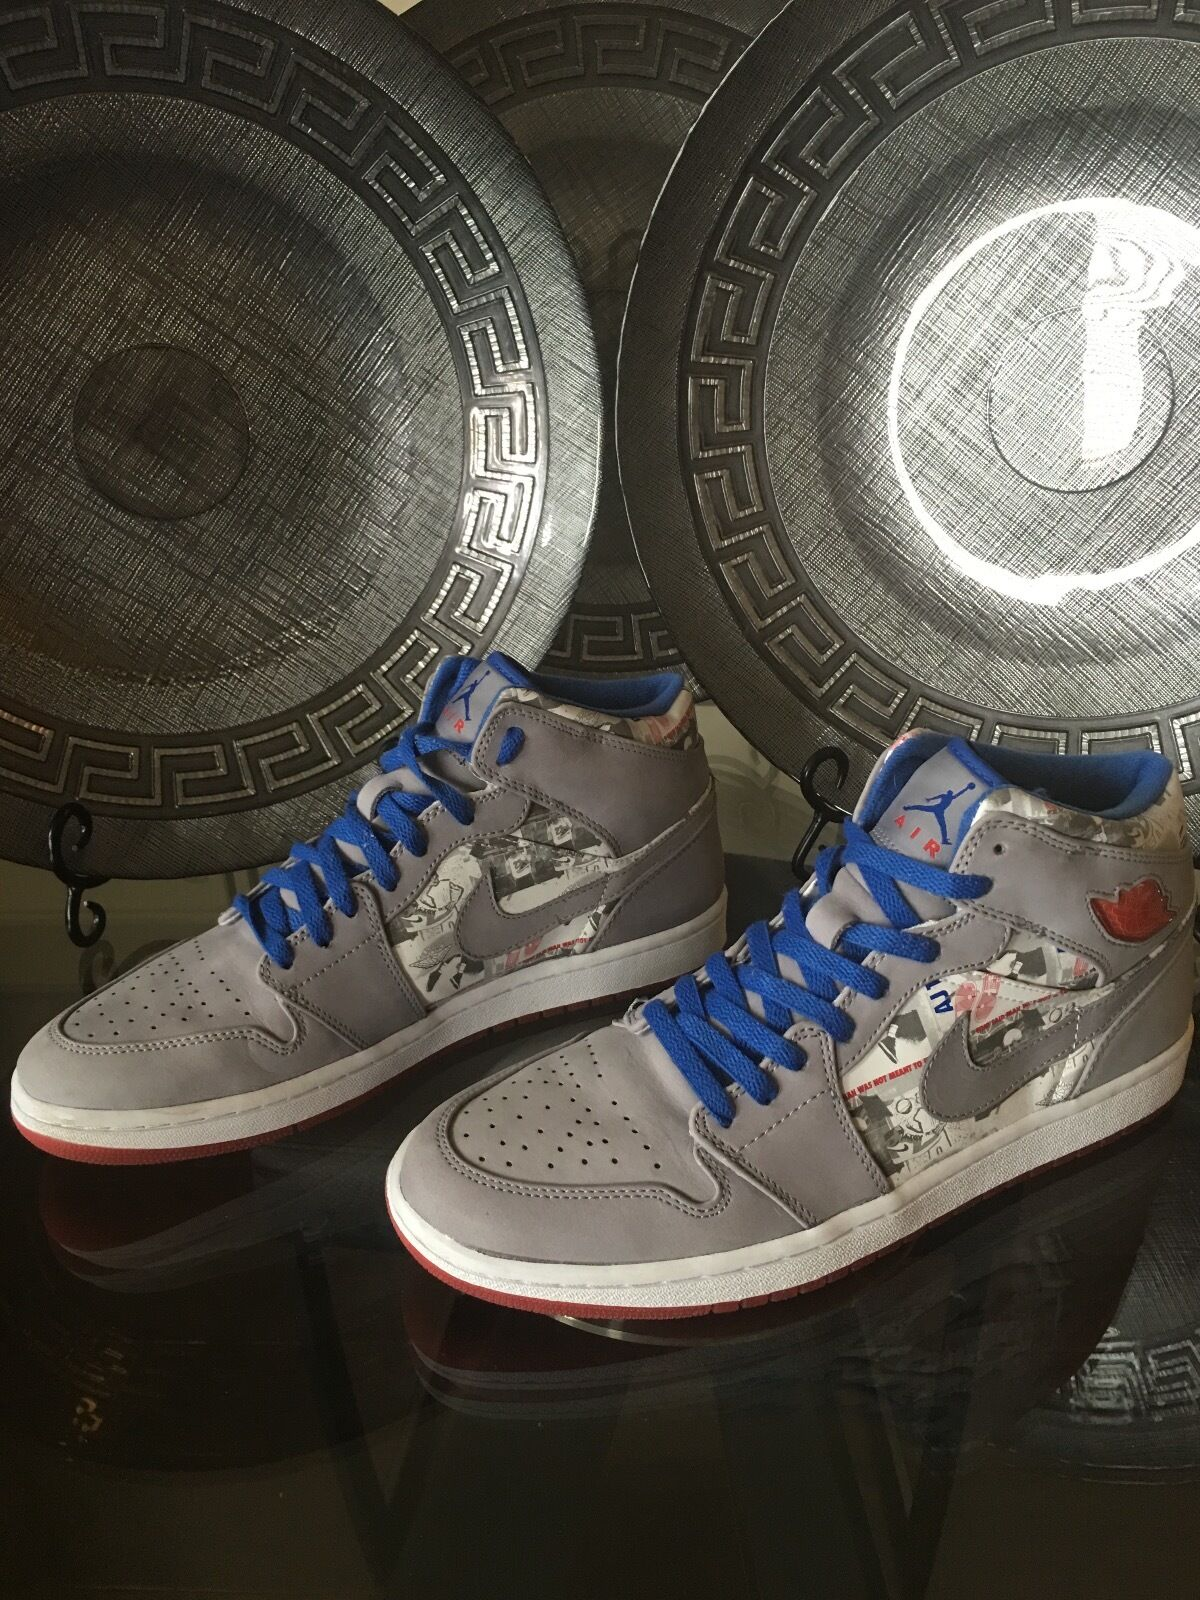 2006 Nike Air Jordan Retro1 Basketball shoes GrayBlue,RedWht 315794-041 Price reduction